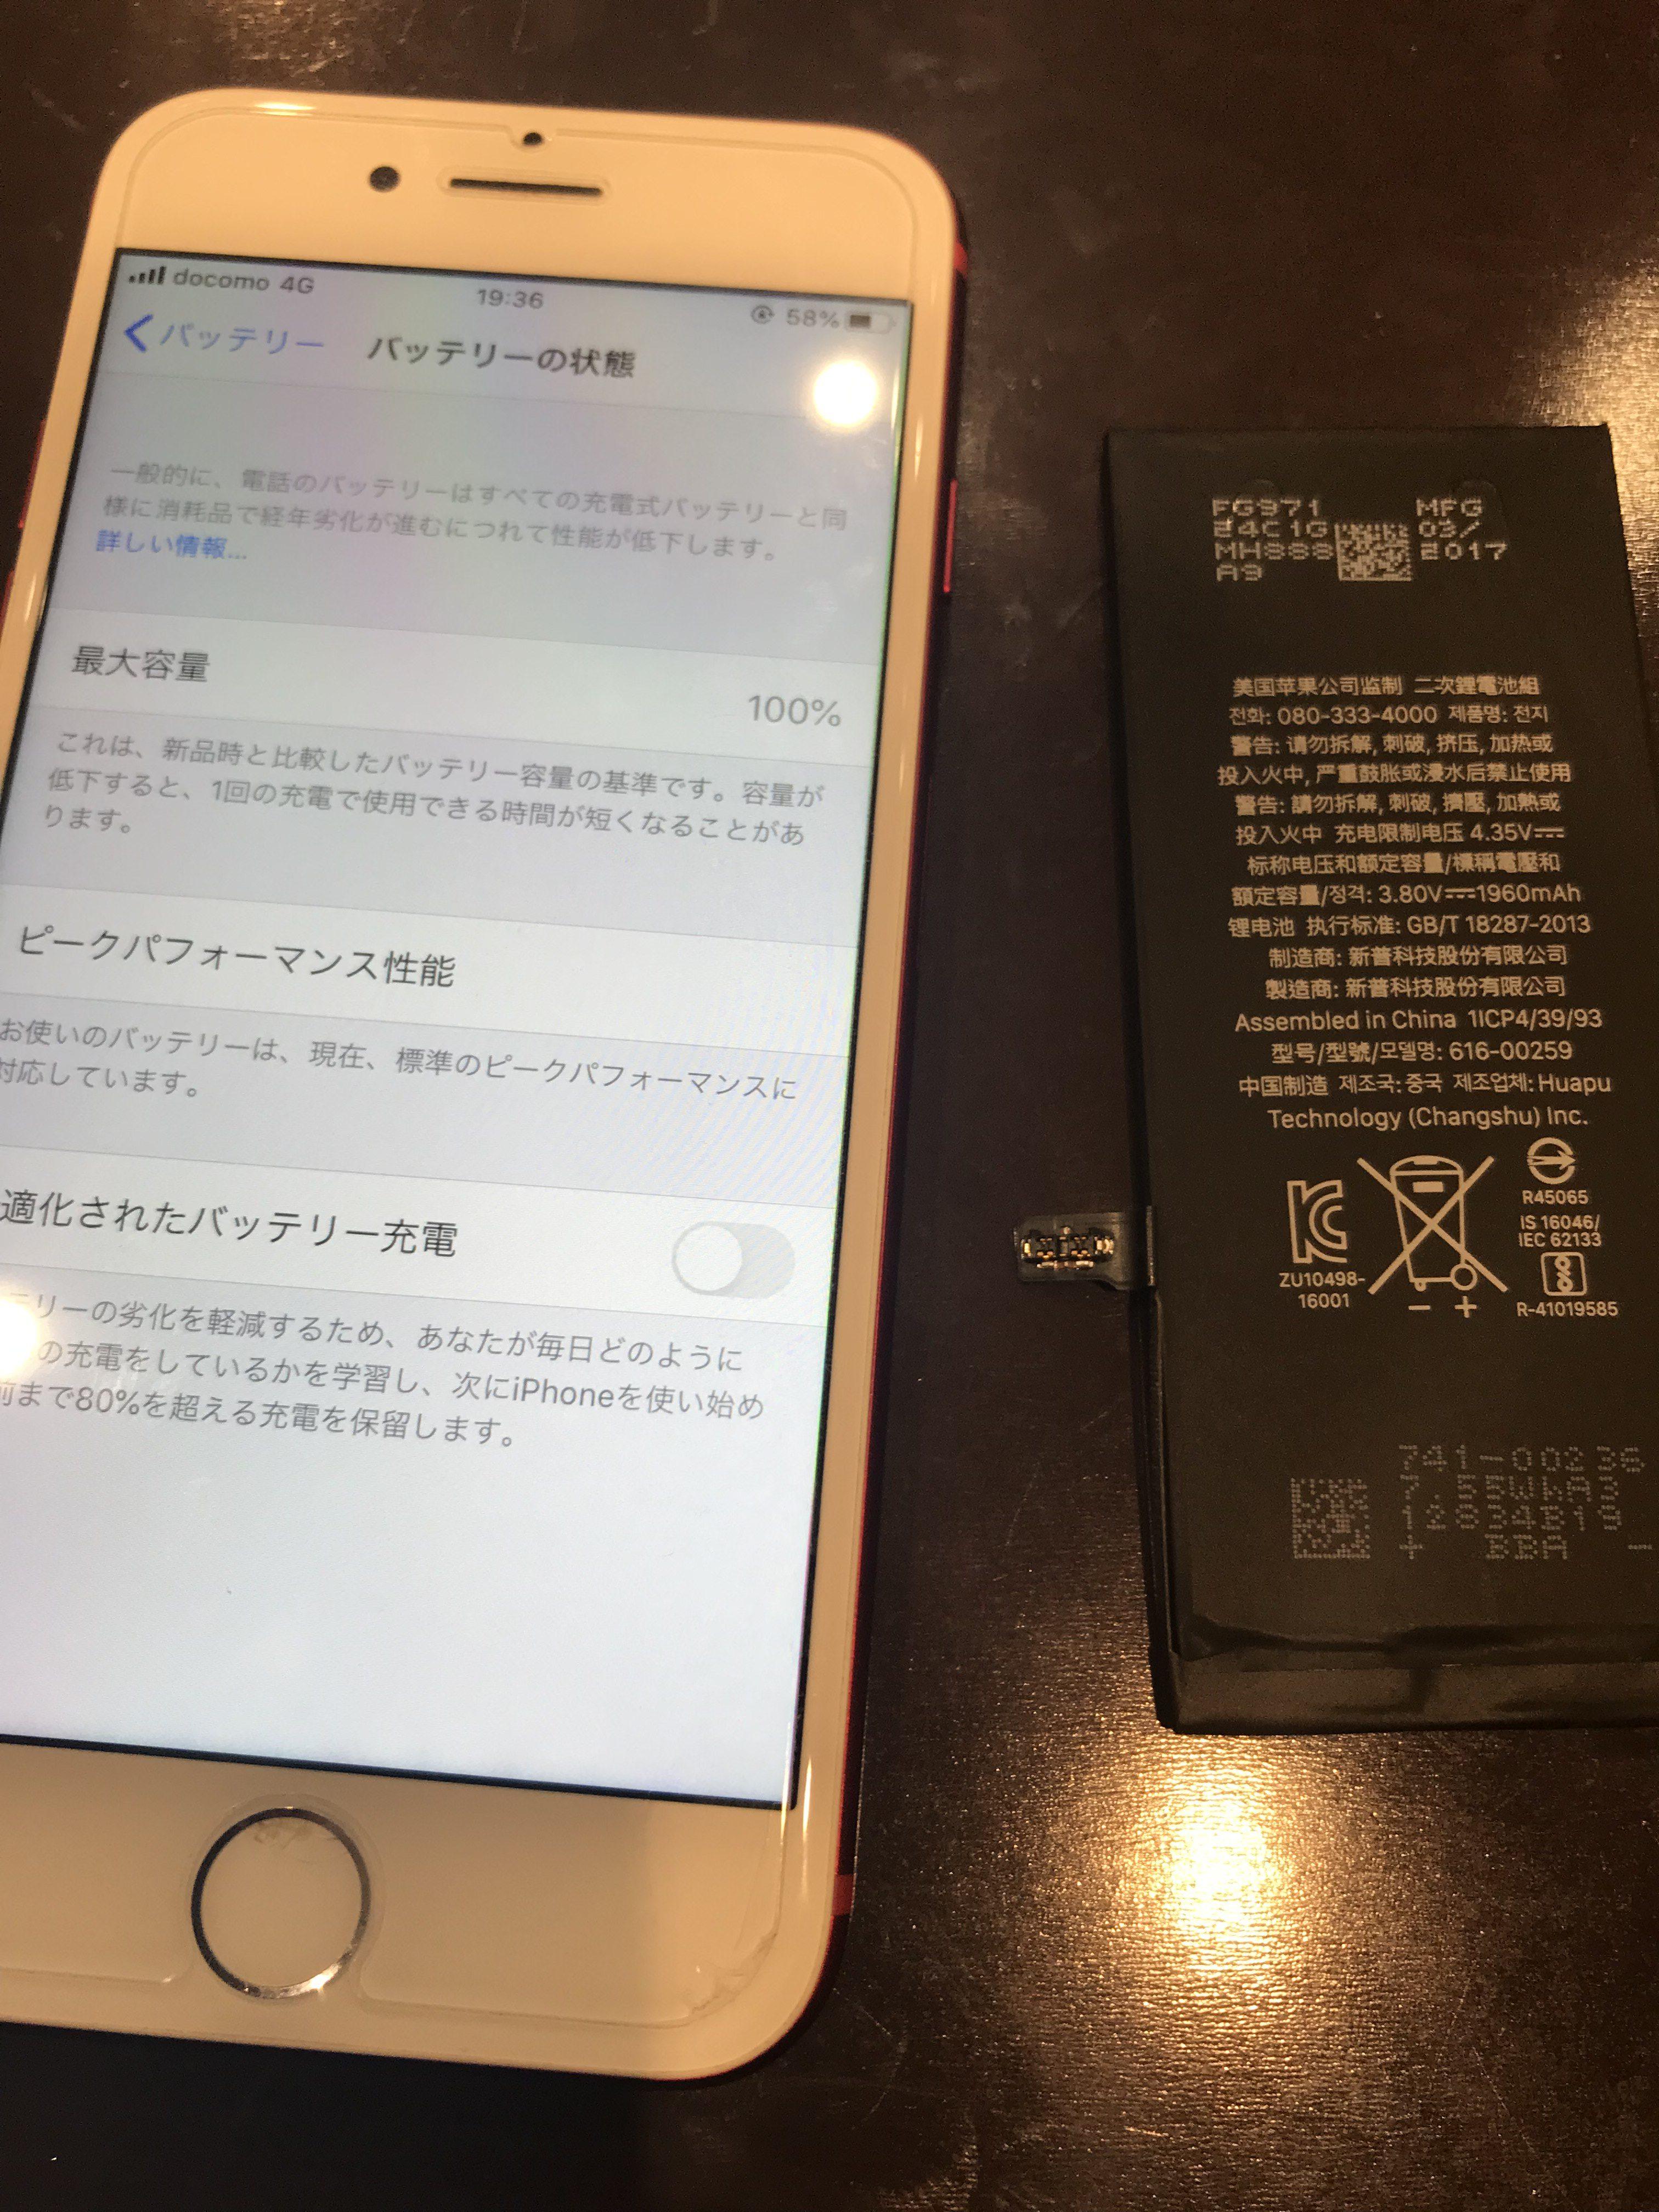 iPhone7バッテリー交換<岡山県倉敷市からご来店>BLACK FRIDAYセール!!あと3日で終了!!この得な機会にぜひご来店下さい!!